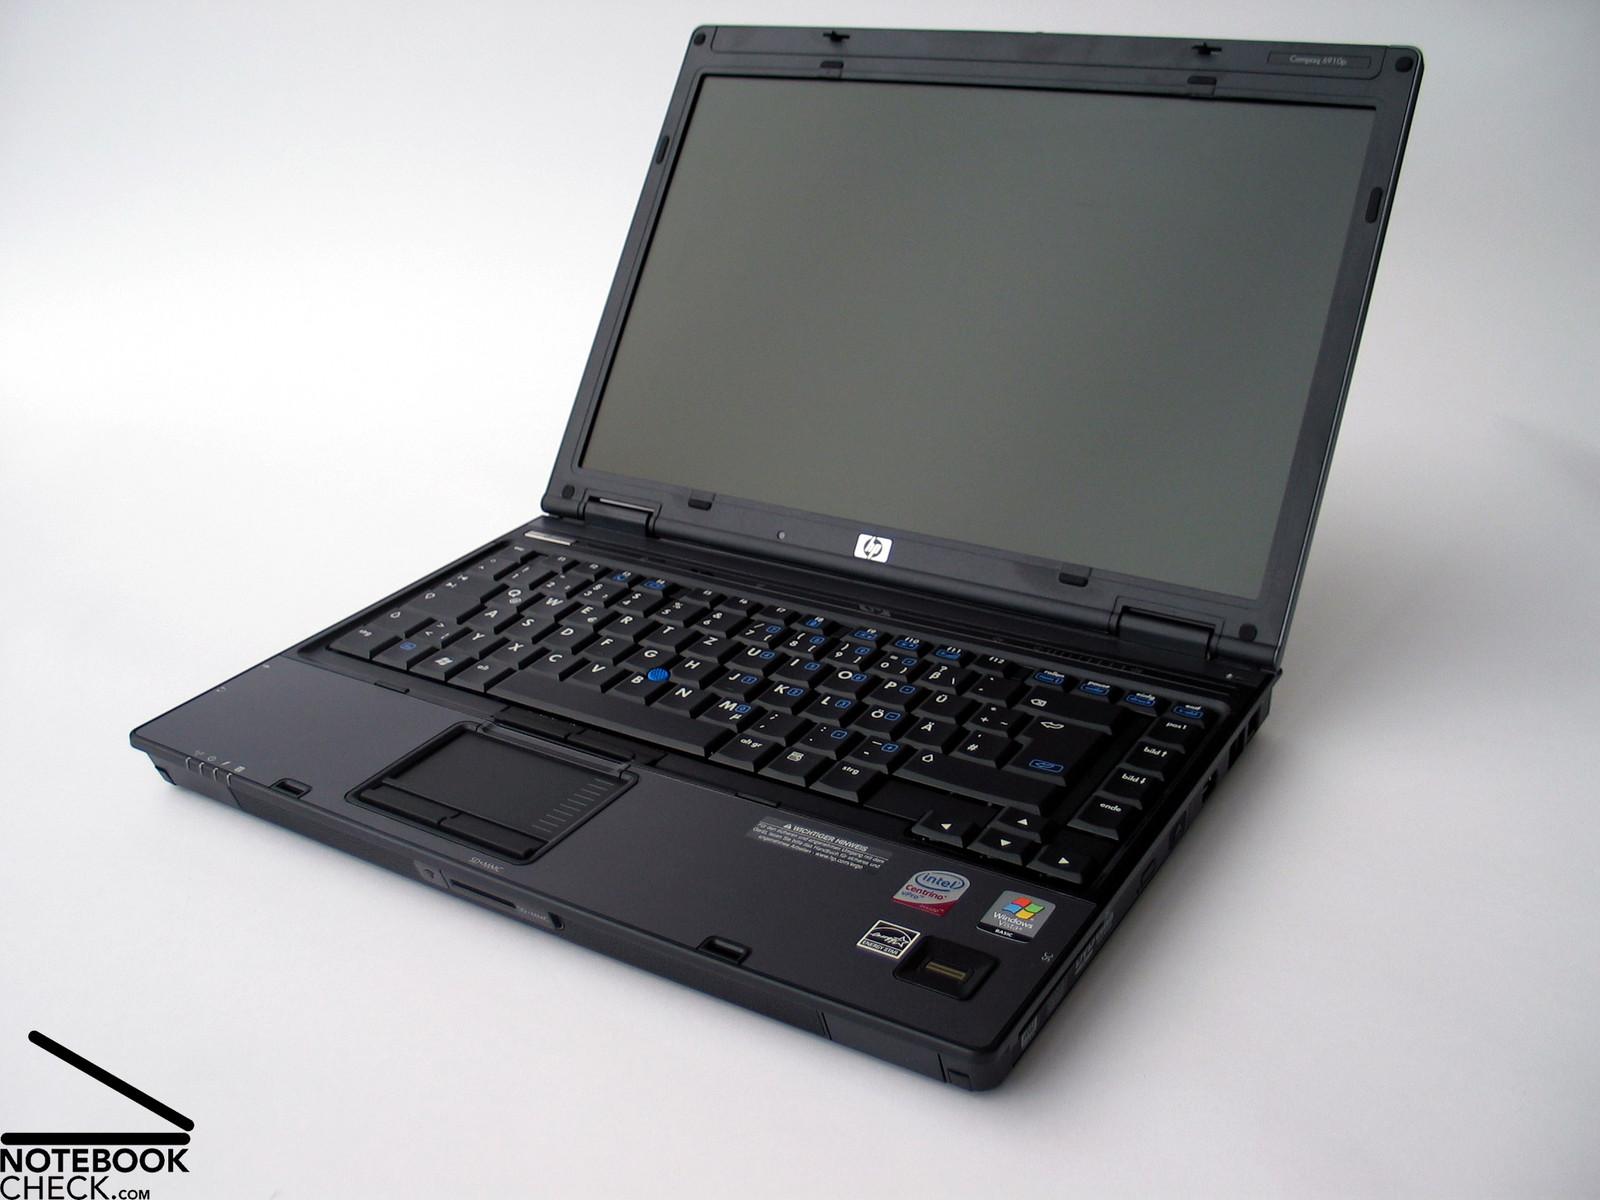 HP Compaq 6910p Notebook Intel 82566MM LAN Driver for Mac Download